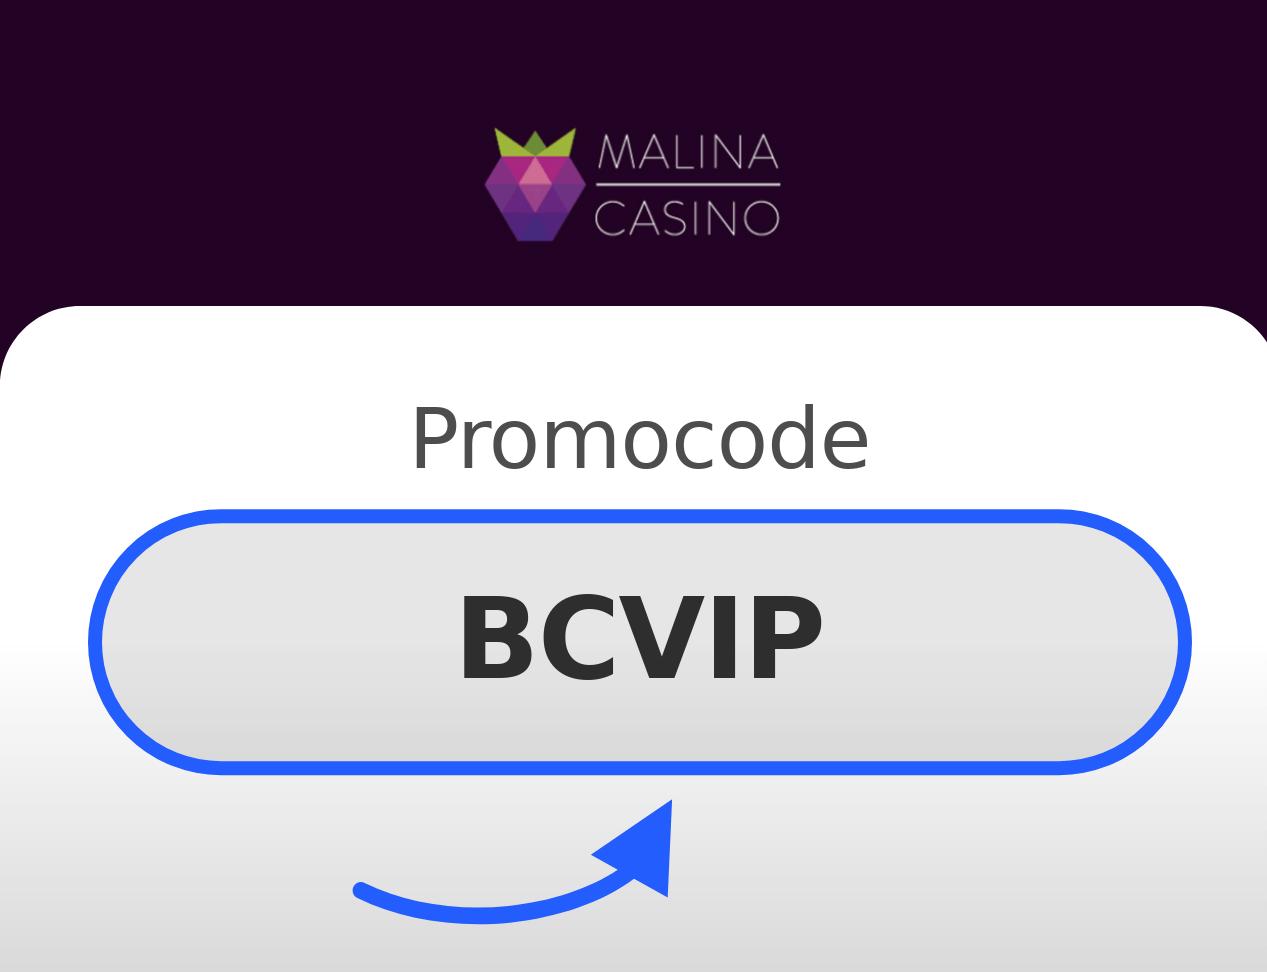 Malina Casino Promo Code